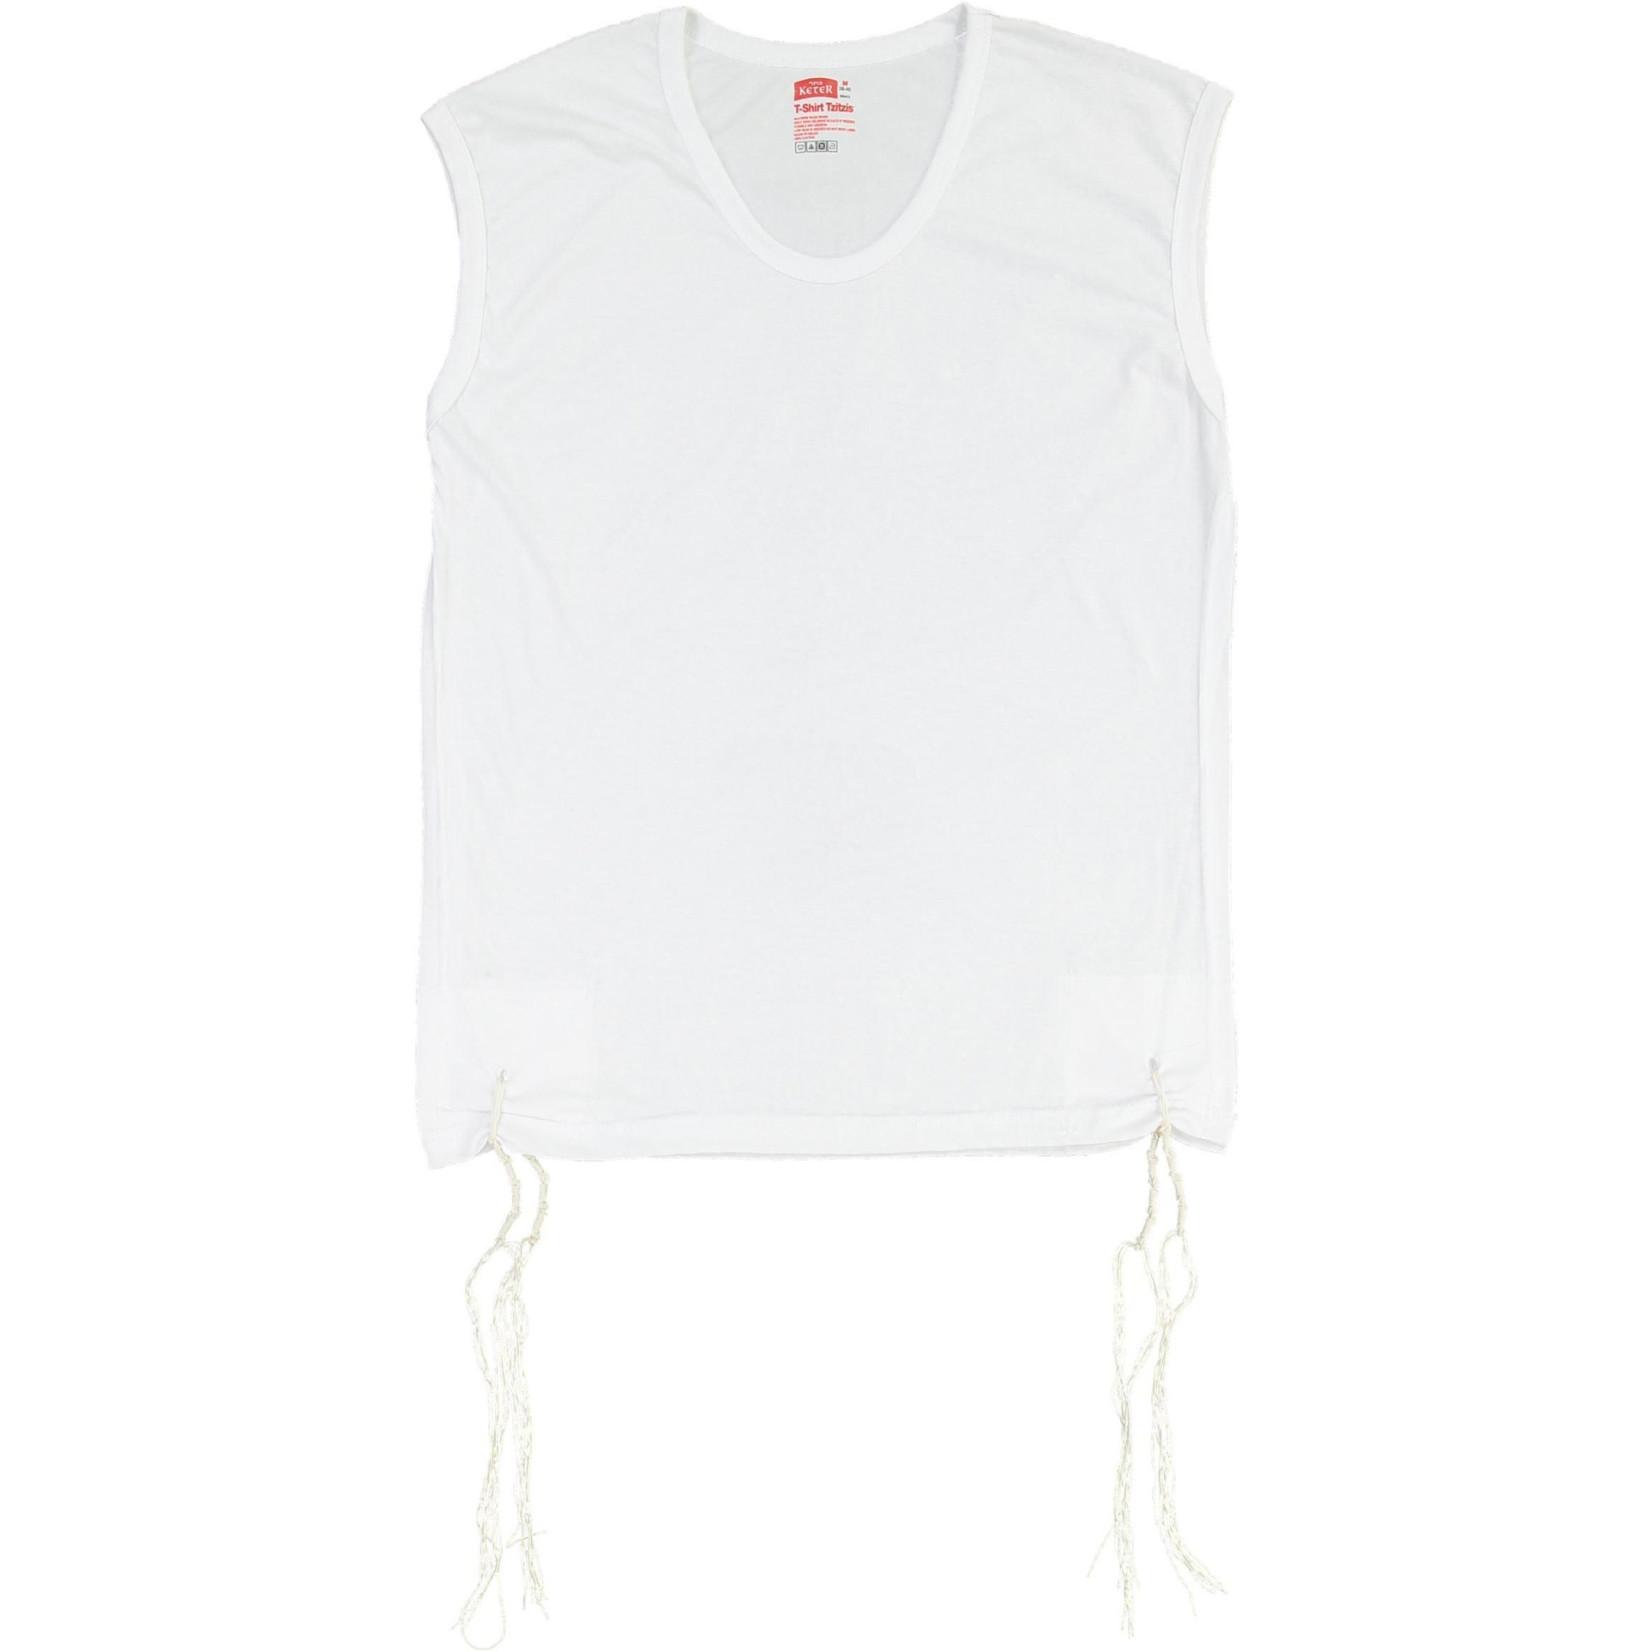 Undershirt-Style Arbah Kanfot, 100% Cotton, Round Neck, Size L